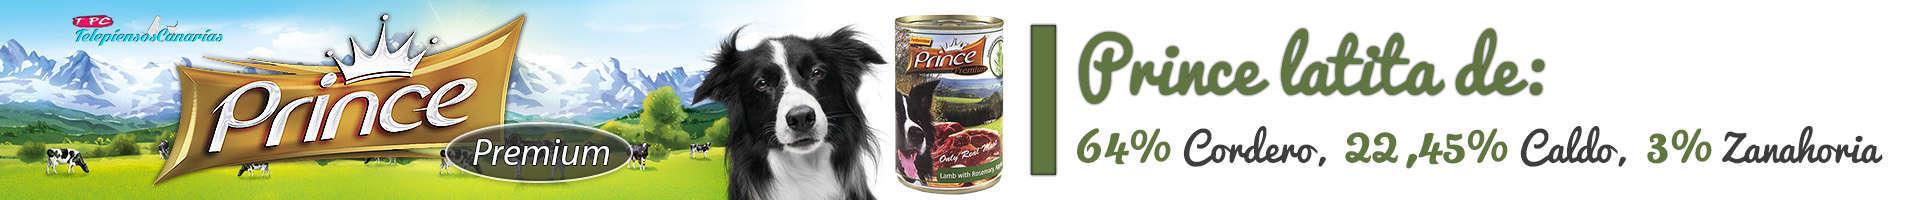 Prince latita de cordero (64%), romero, manzana y zanahoria